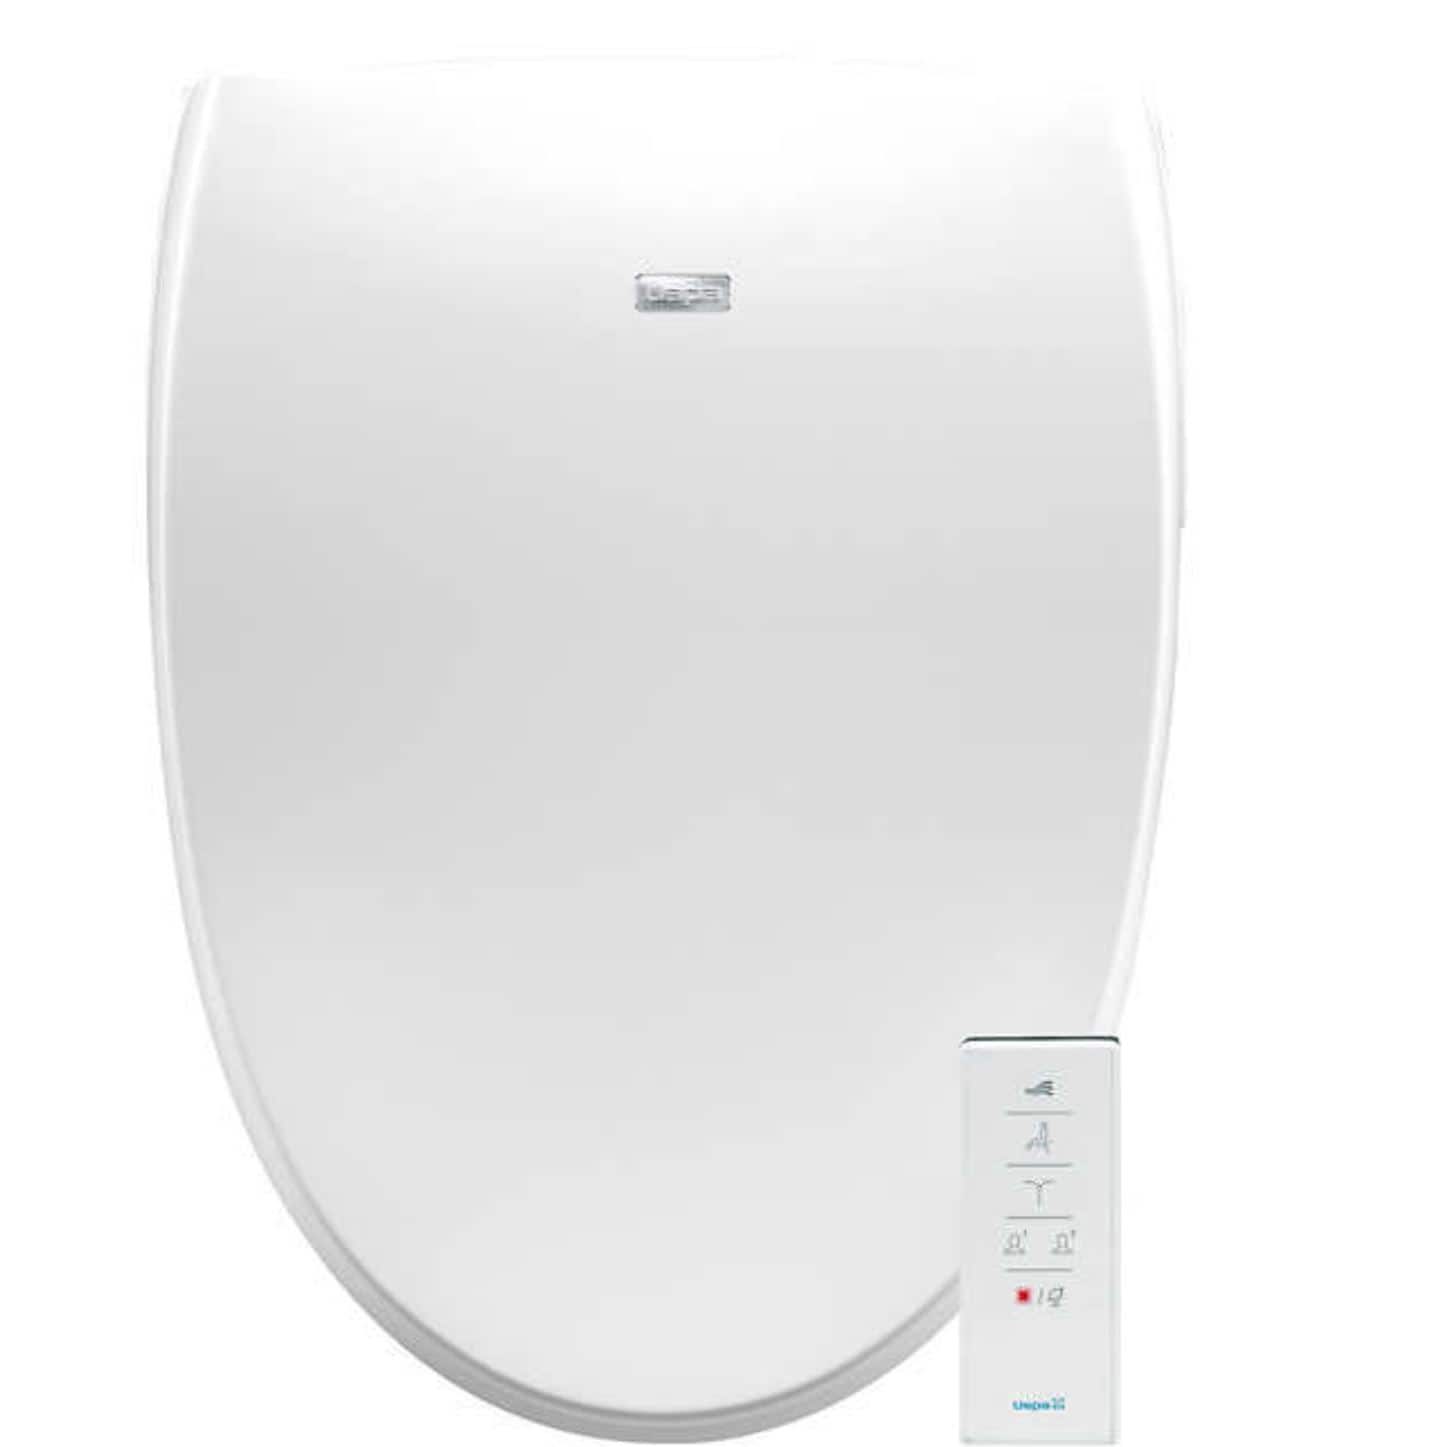 Costco Wholesale: Bio Bidet A8 Serenity Smart Bidet Toilet Seat $249.99